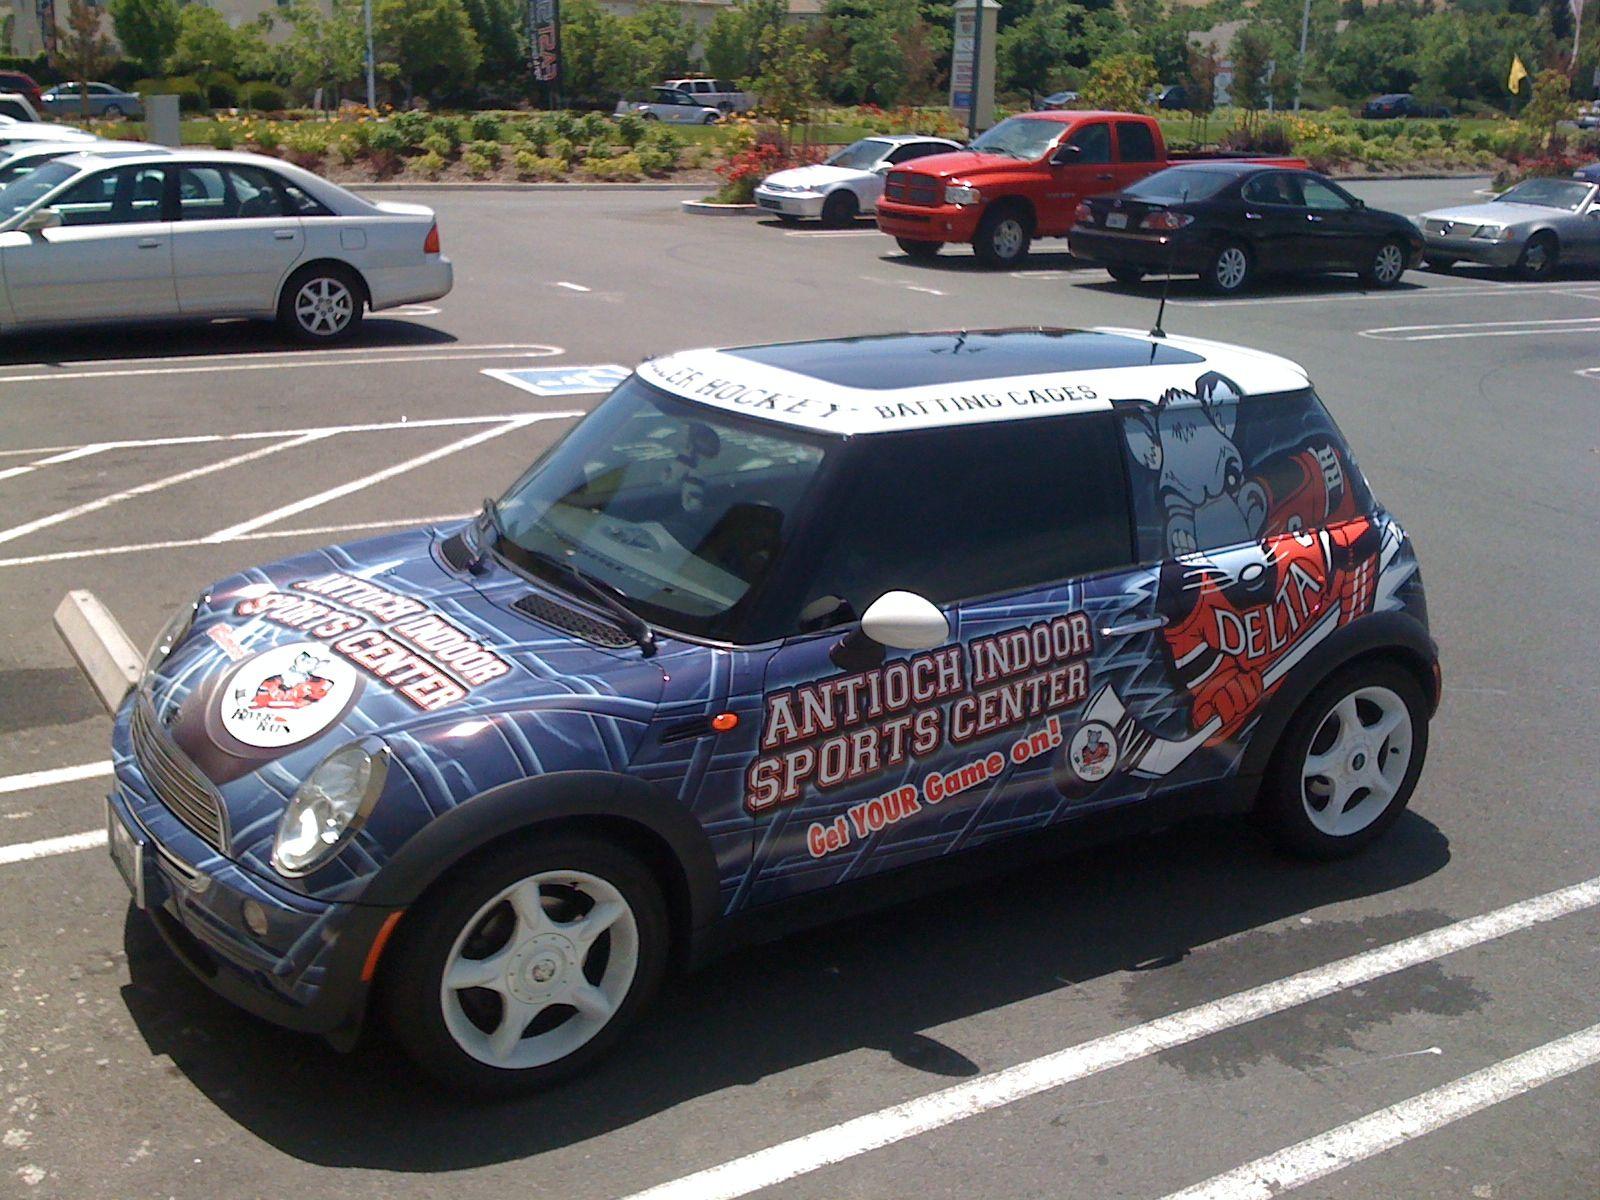 Mini cooper wrap for antioch indoor sports vehicle wrapsmini cooperswrappingindoor